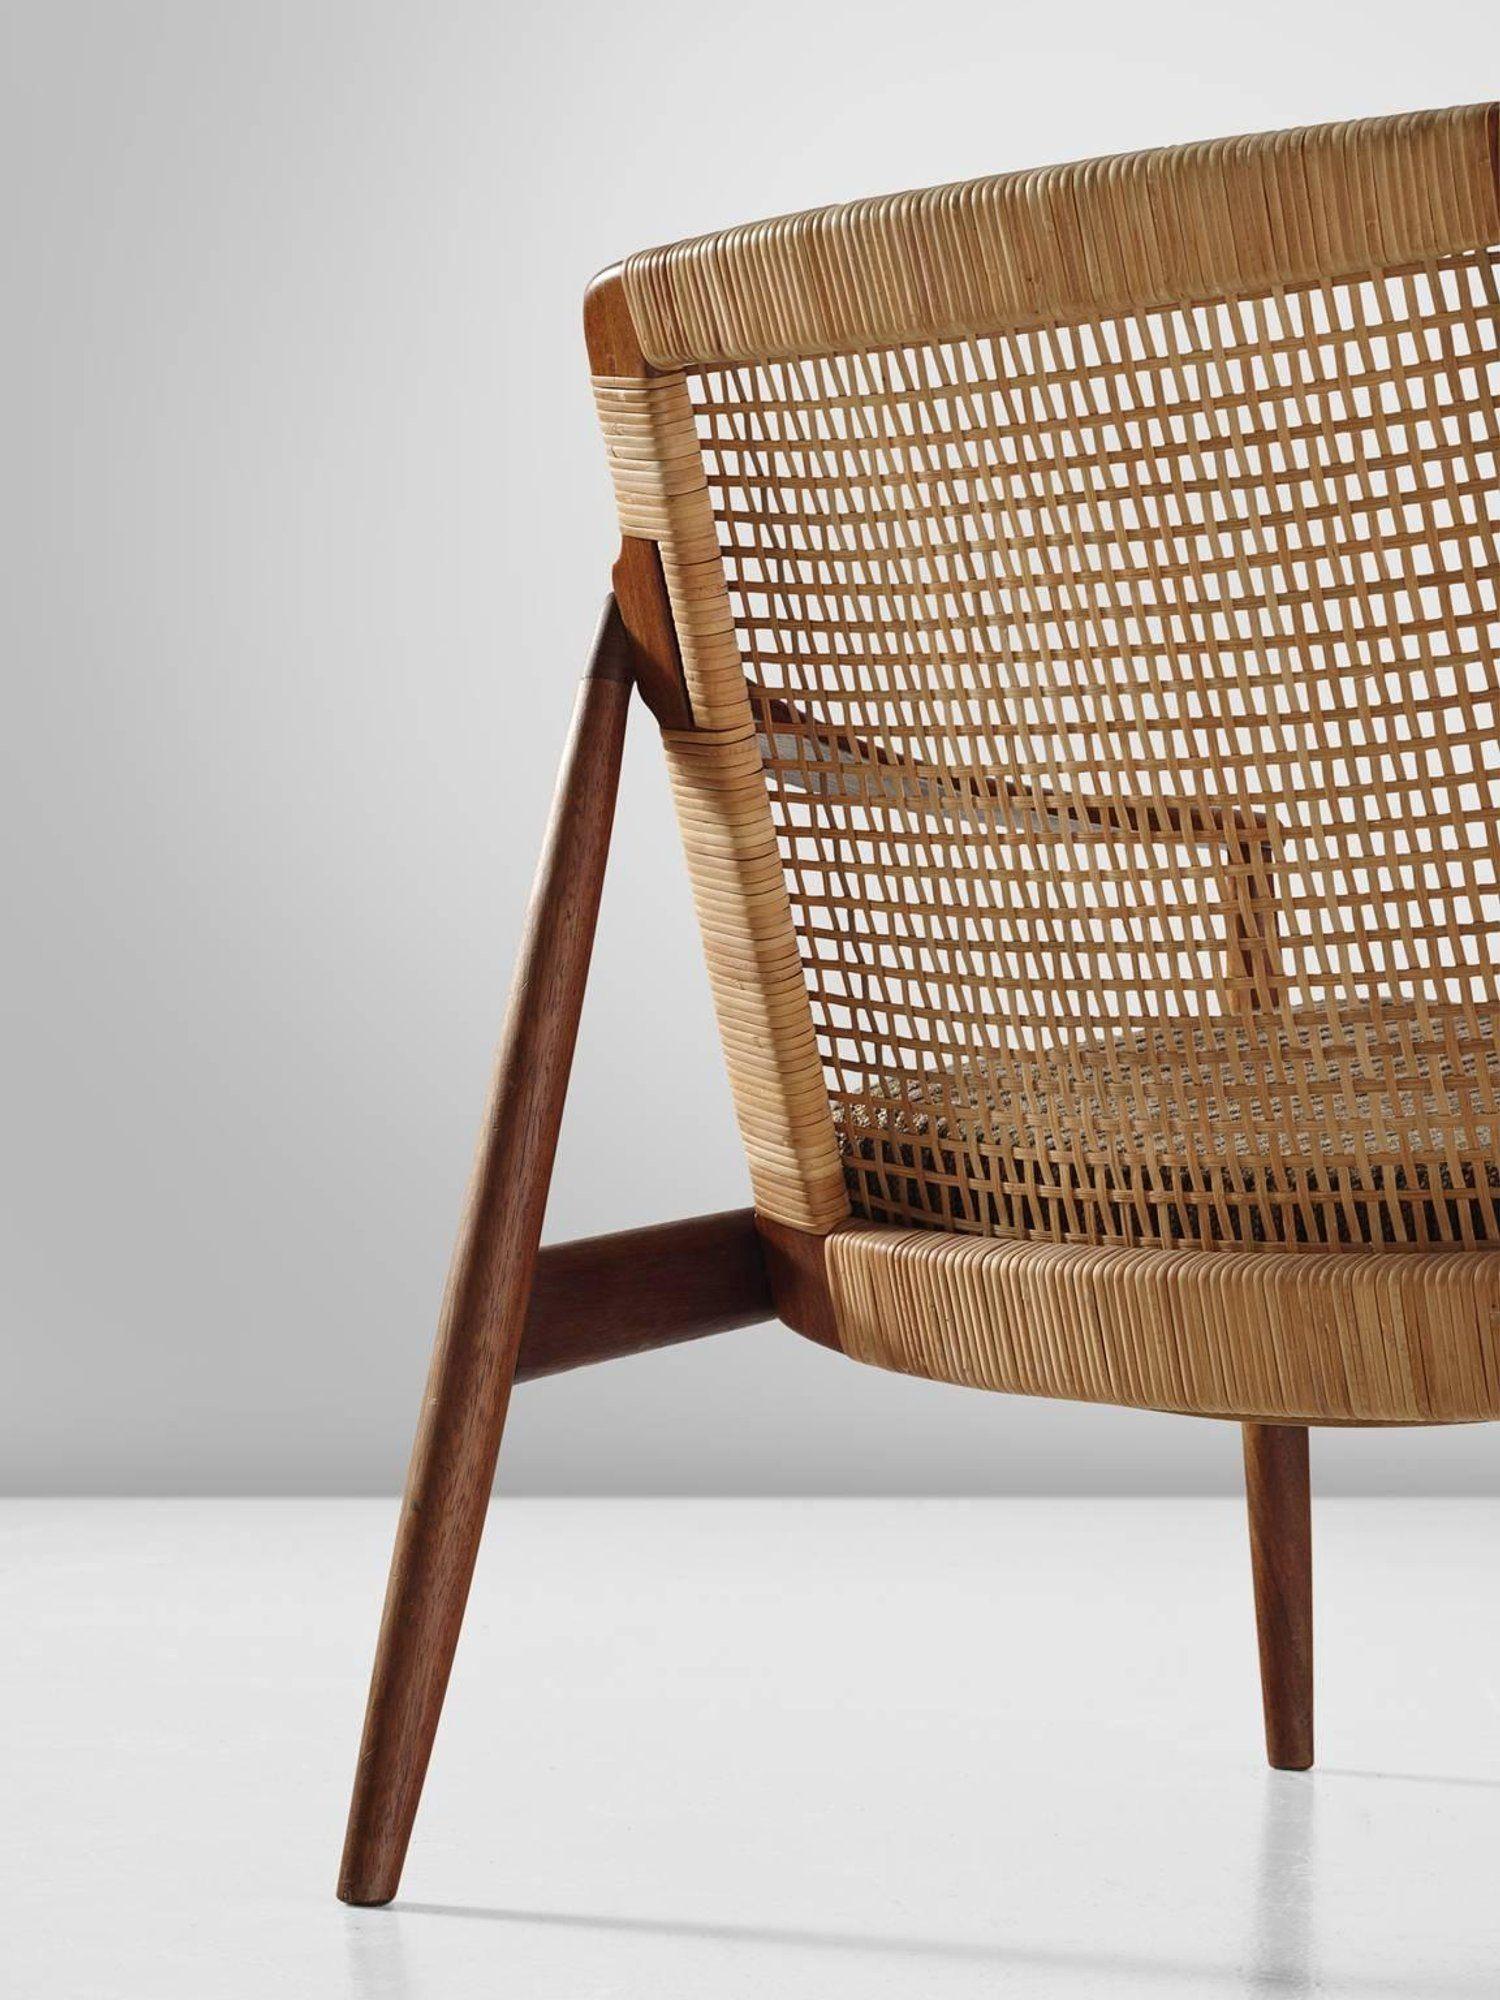 Hartmut Lohmeyer Armchair in Teak and Cane | Modern lounge, Teak and ...